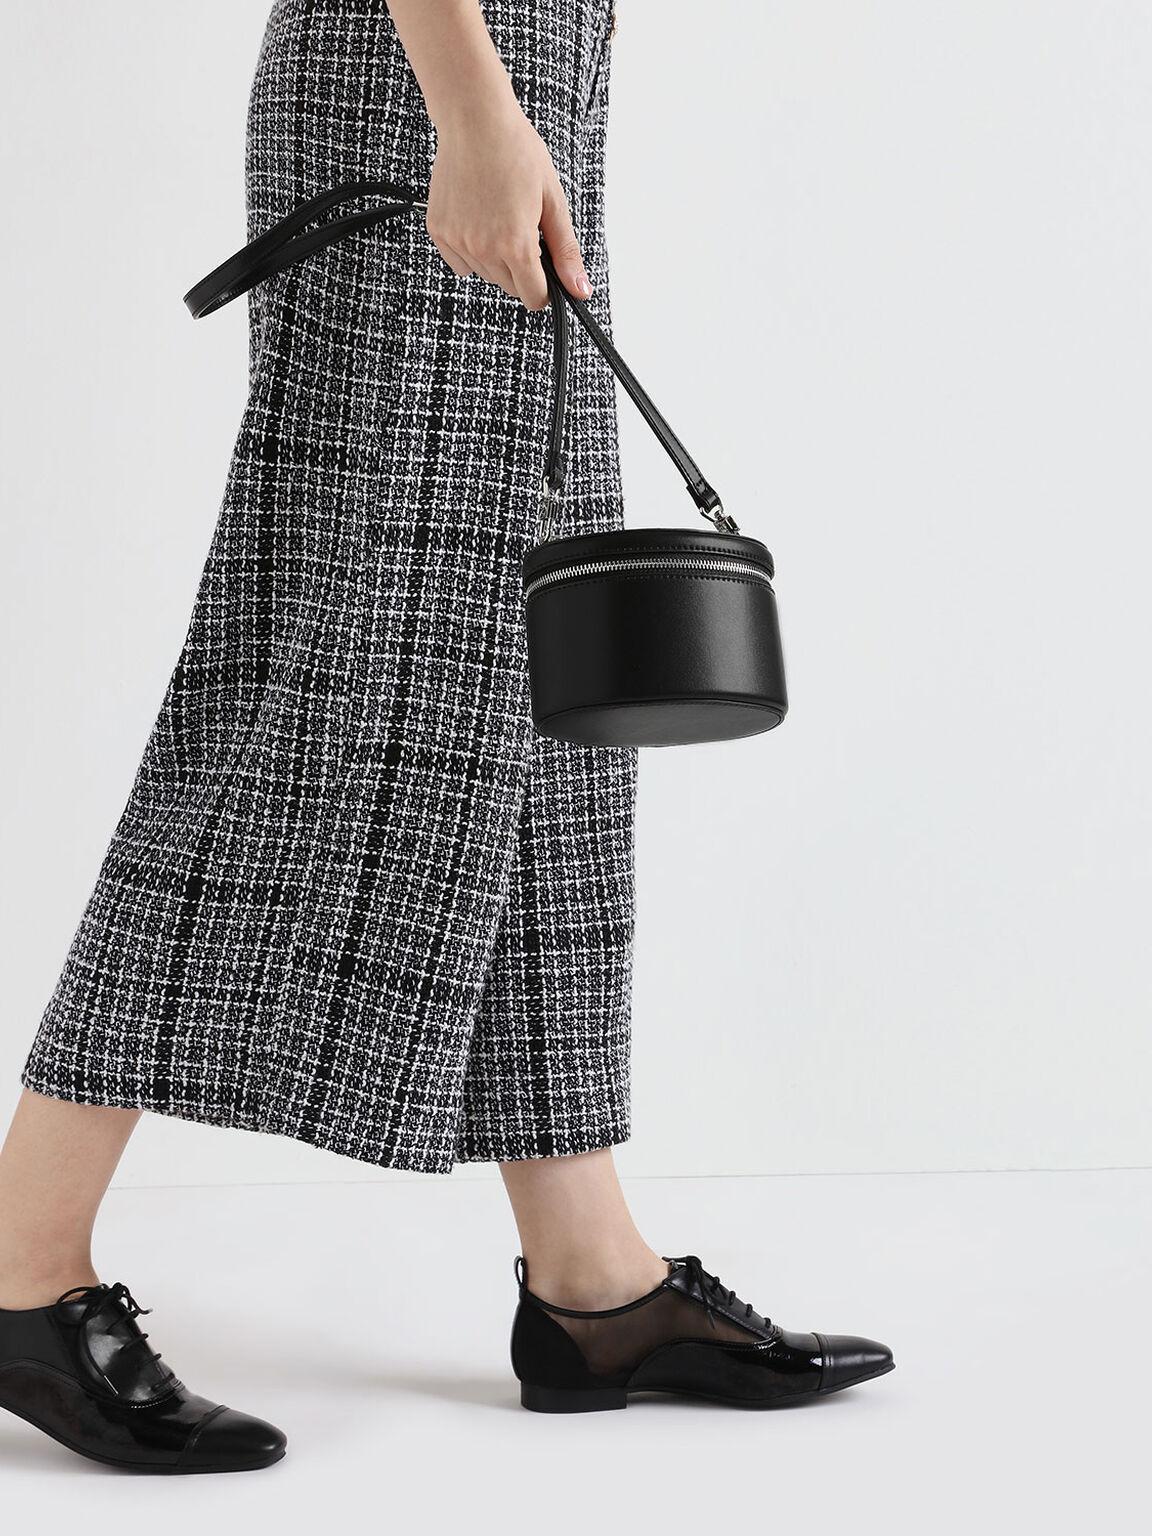 Metal Top Handle Round Structured Bag, Black, hi-res